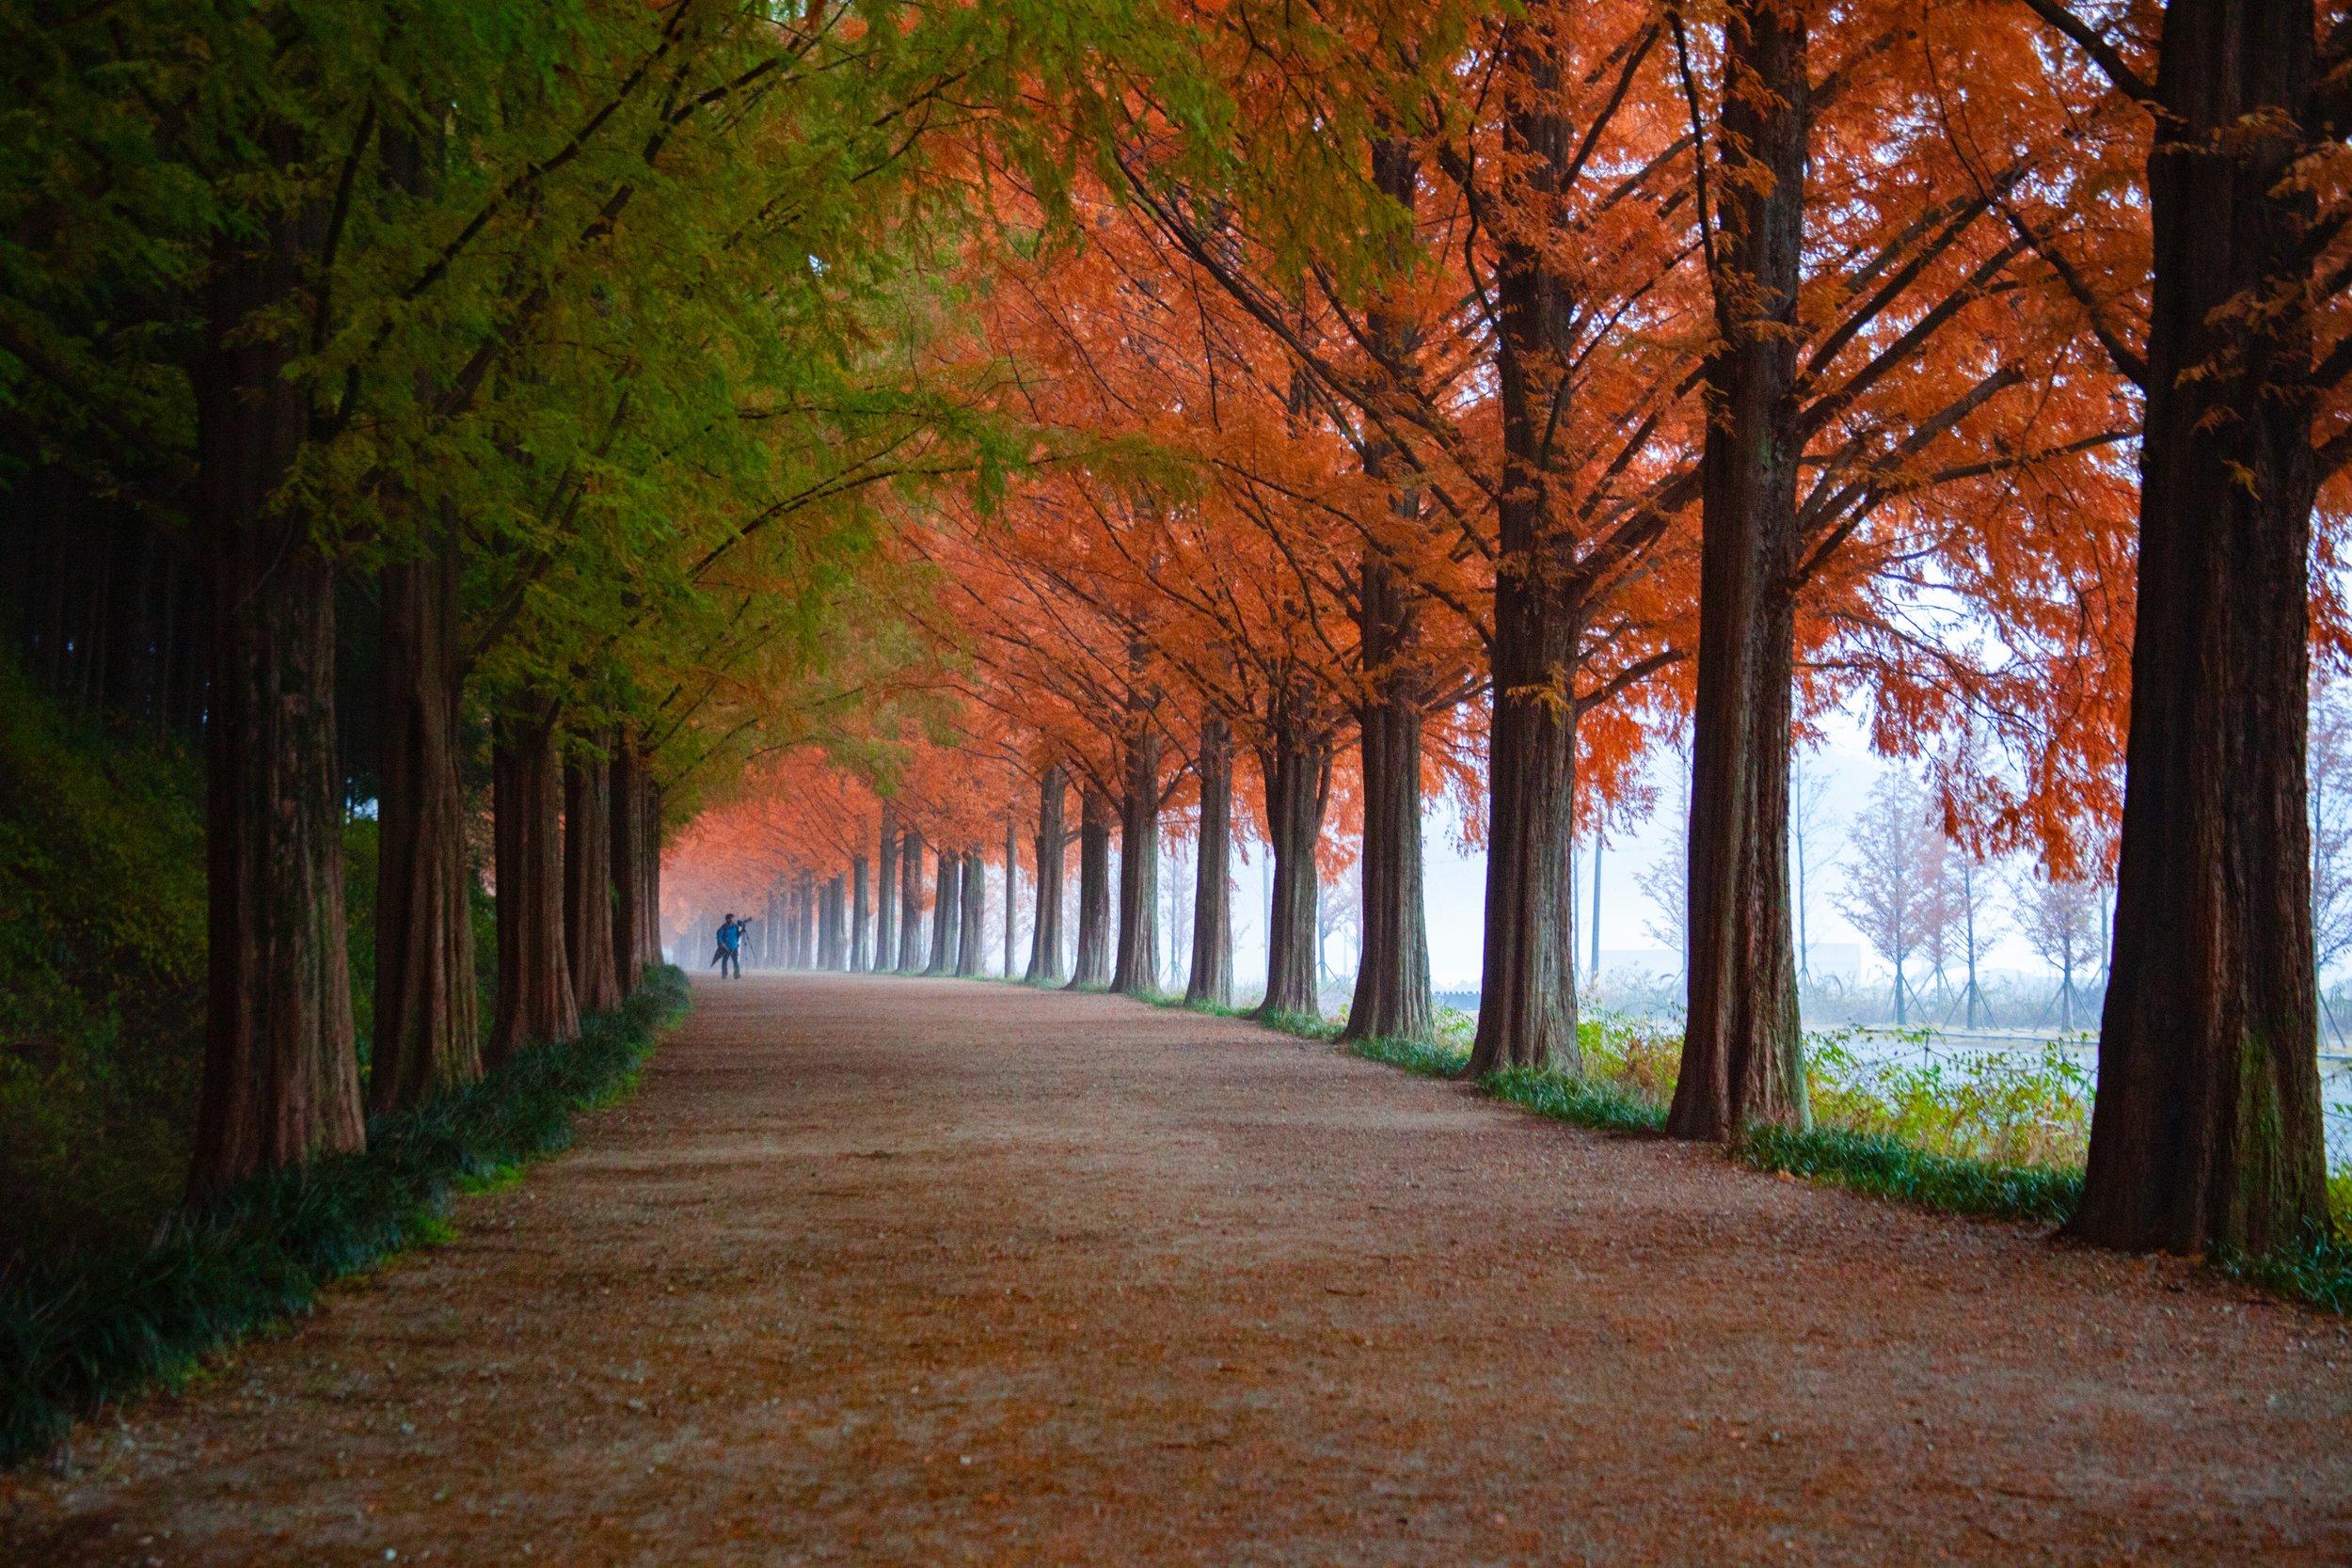 4k-wallpaper-autumn-branches-2734421.jpg